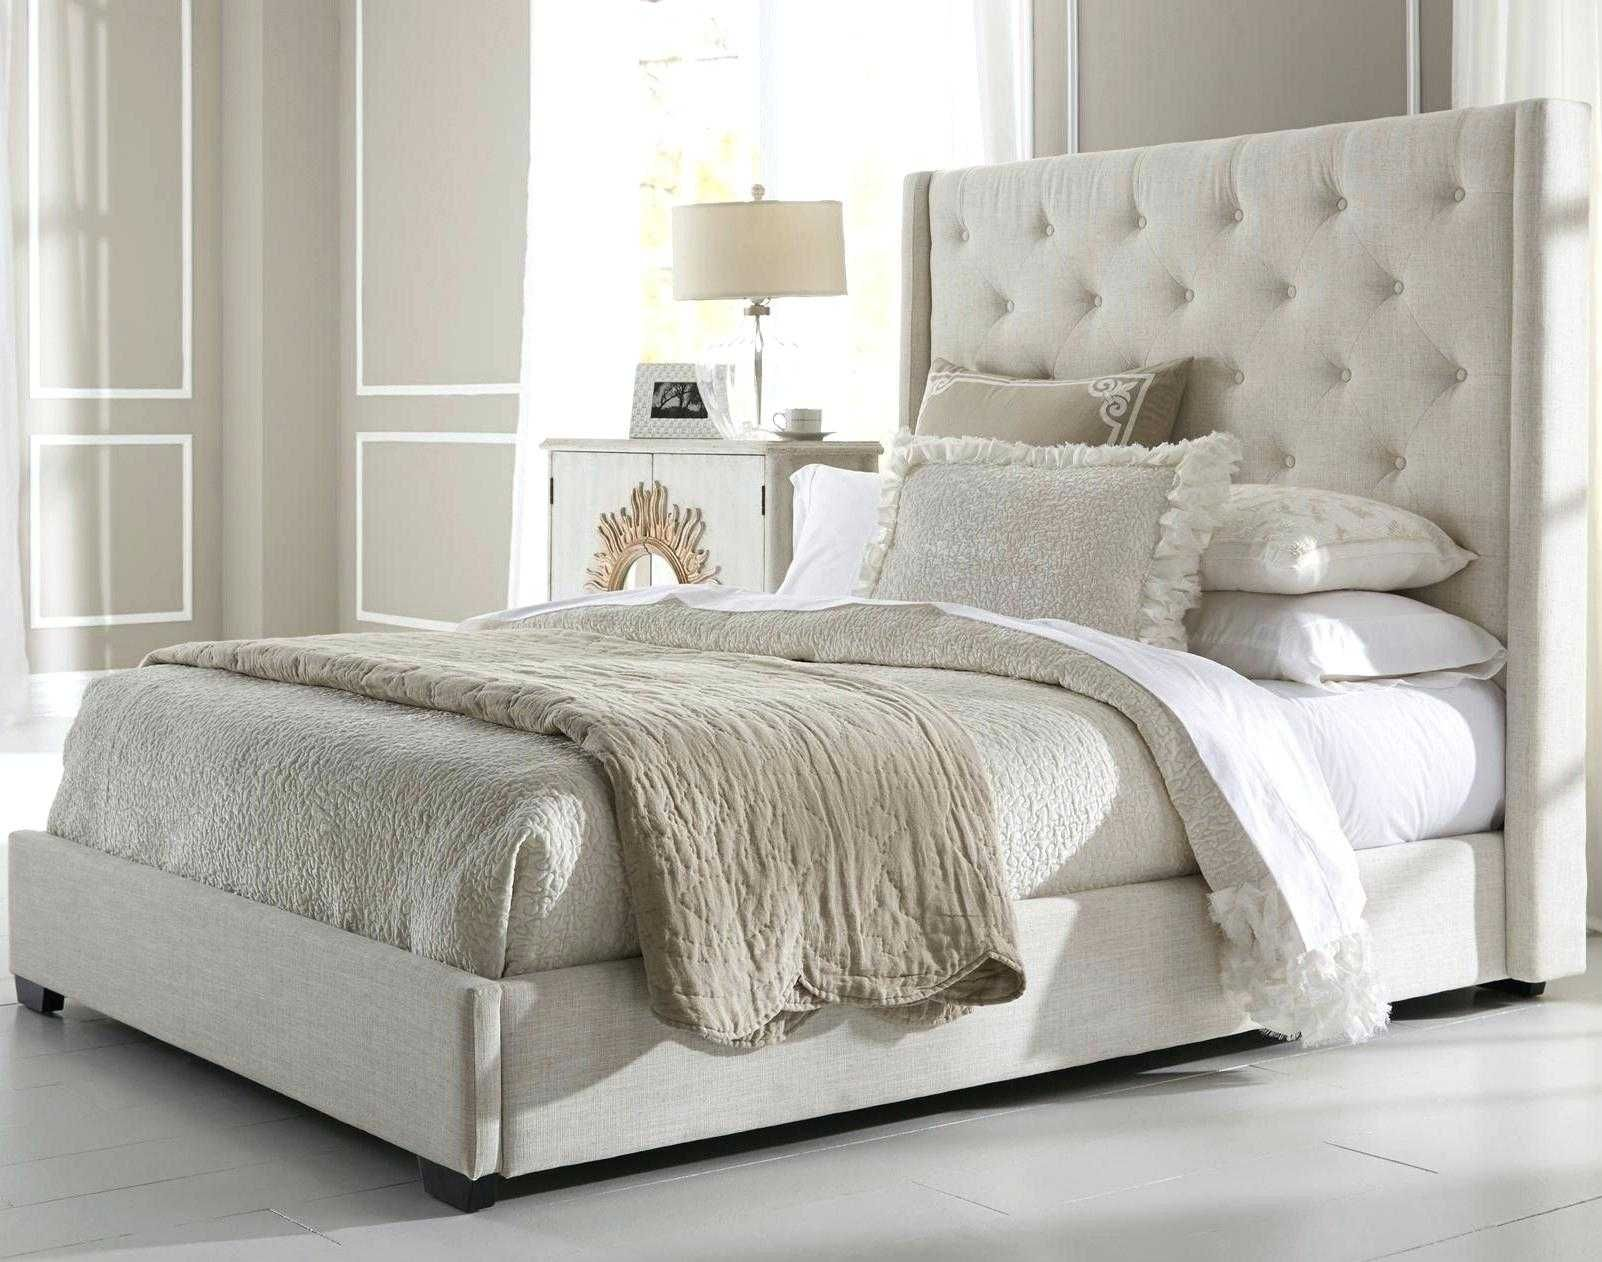 Gallery Of Sleep Number Bed Headboard Ideas And Impressive